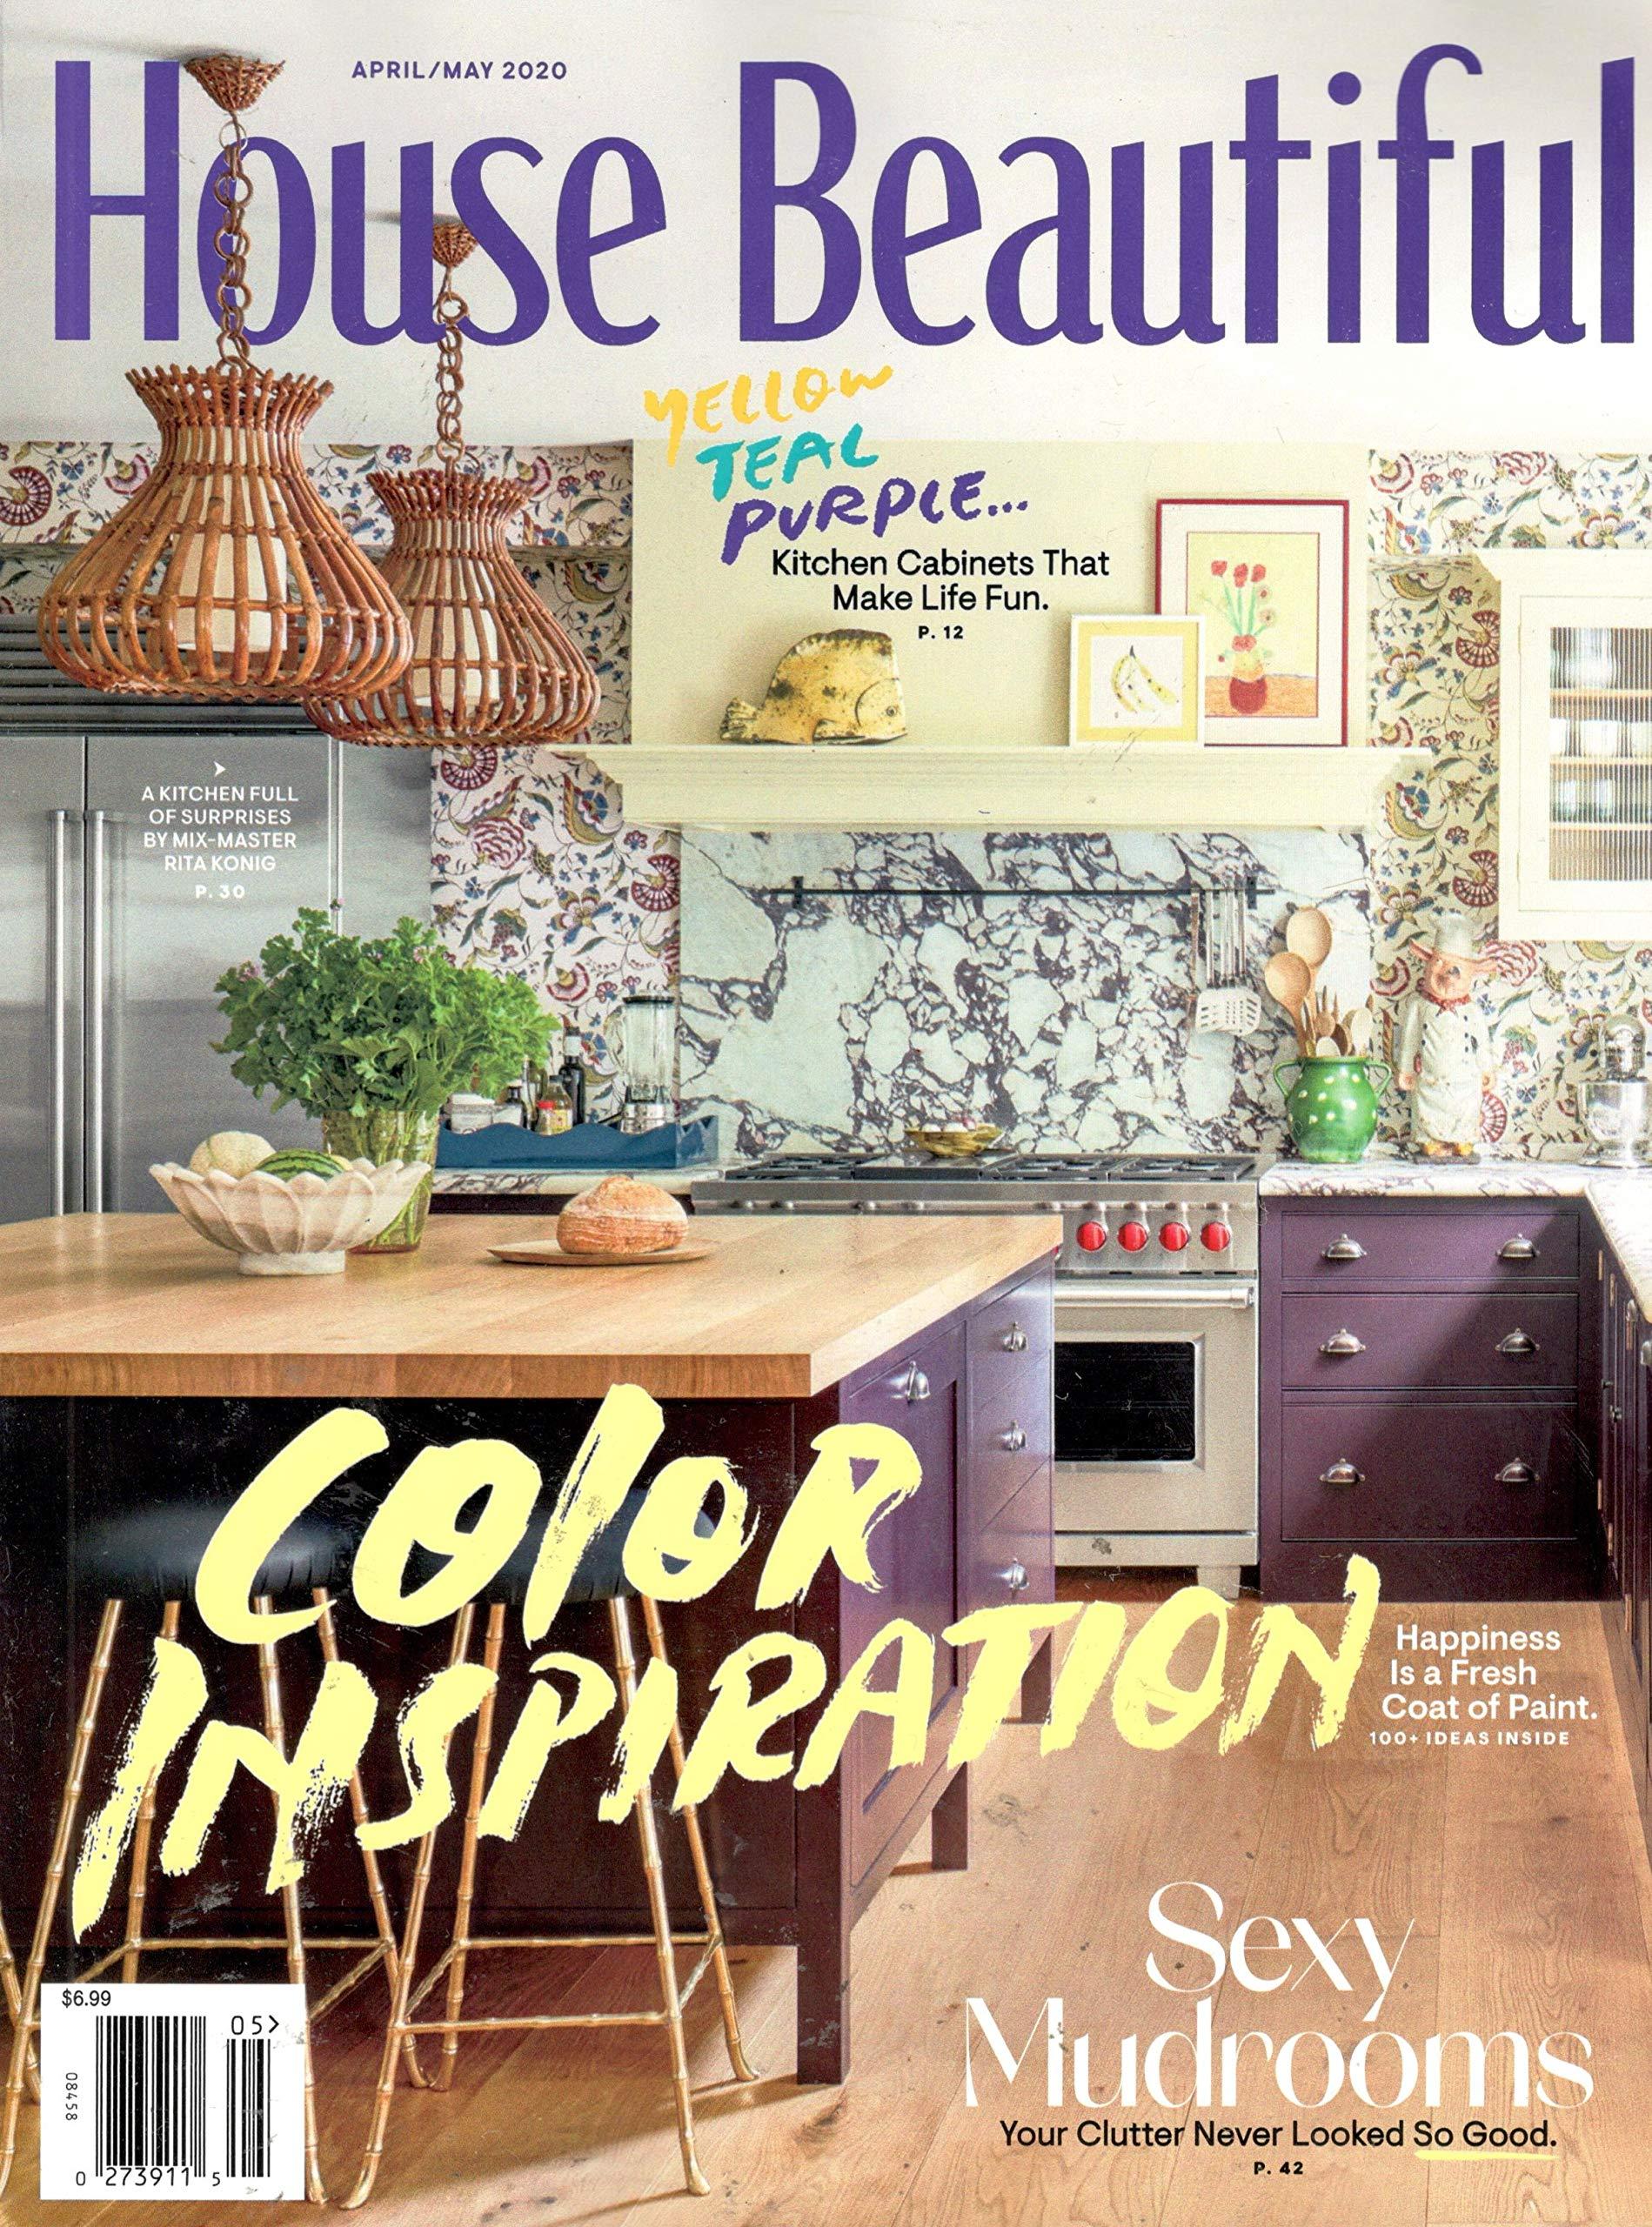 House Beautiful Magazine (April, 13) Color Inspiration: House